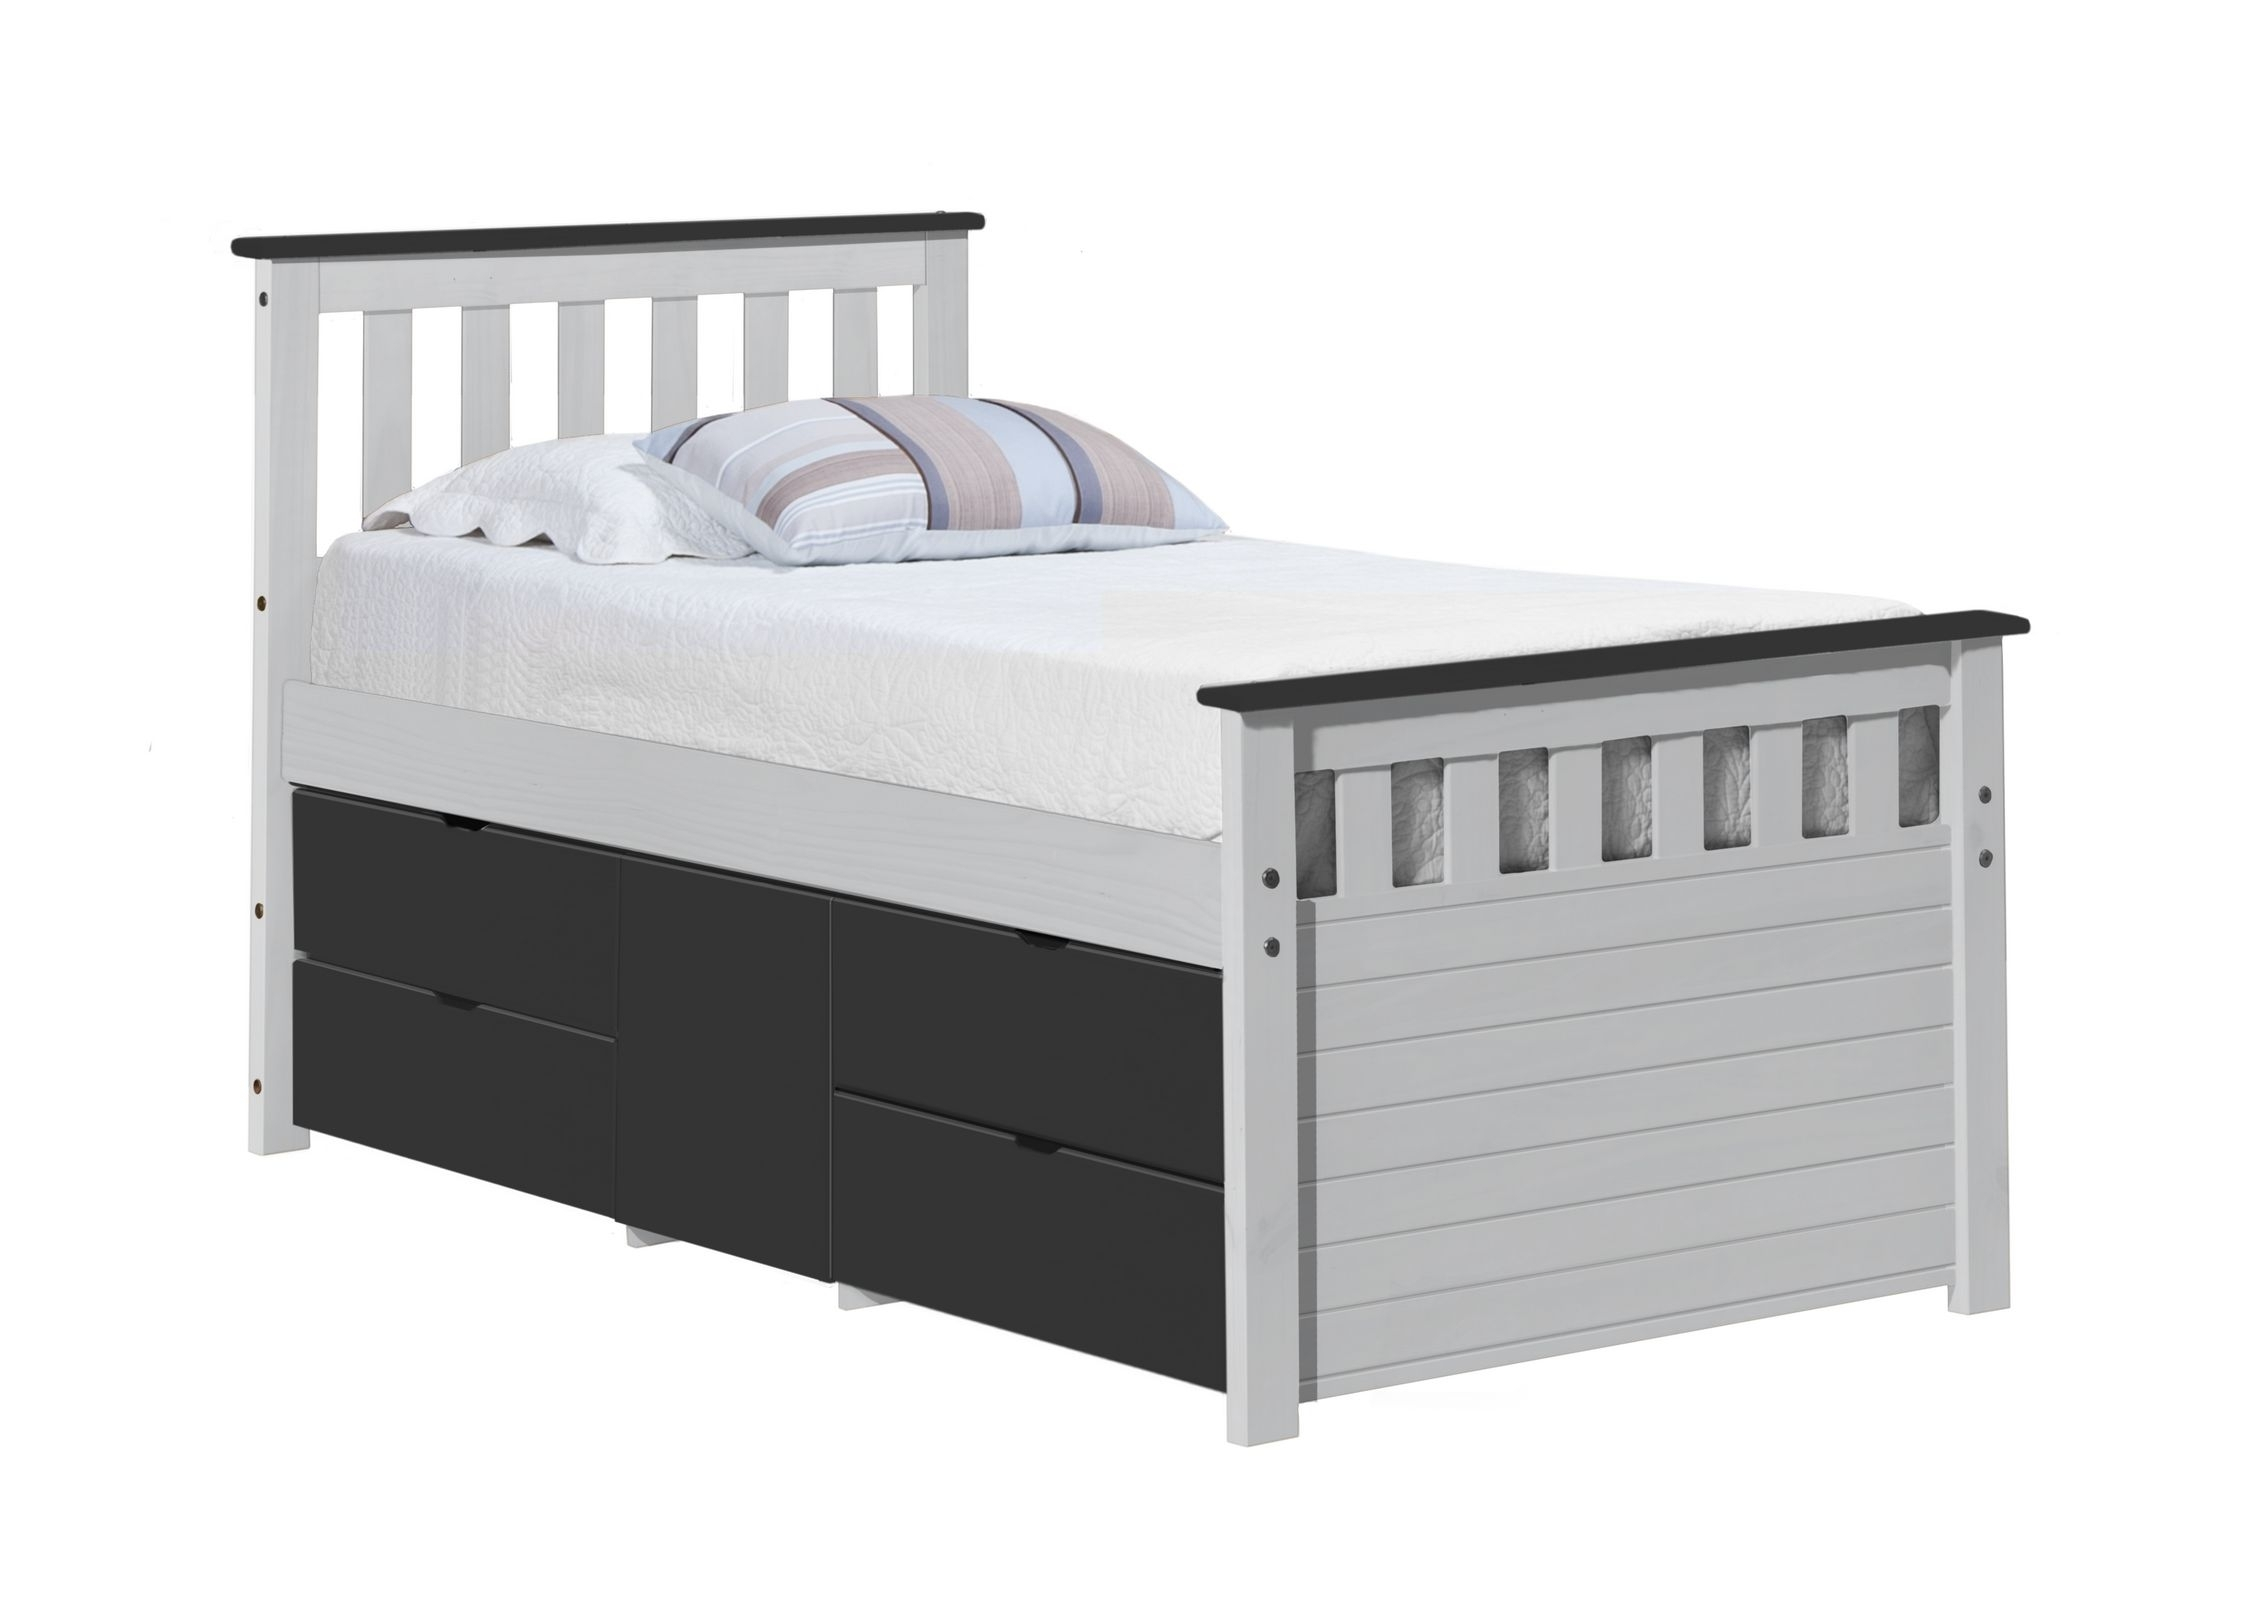 lit pin massif lasur blanc et graphite 90 x 190 cm kapta. Black Bedroom Furniture Sets. Home Design Ideas